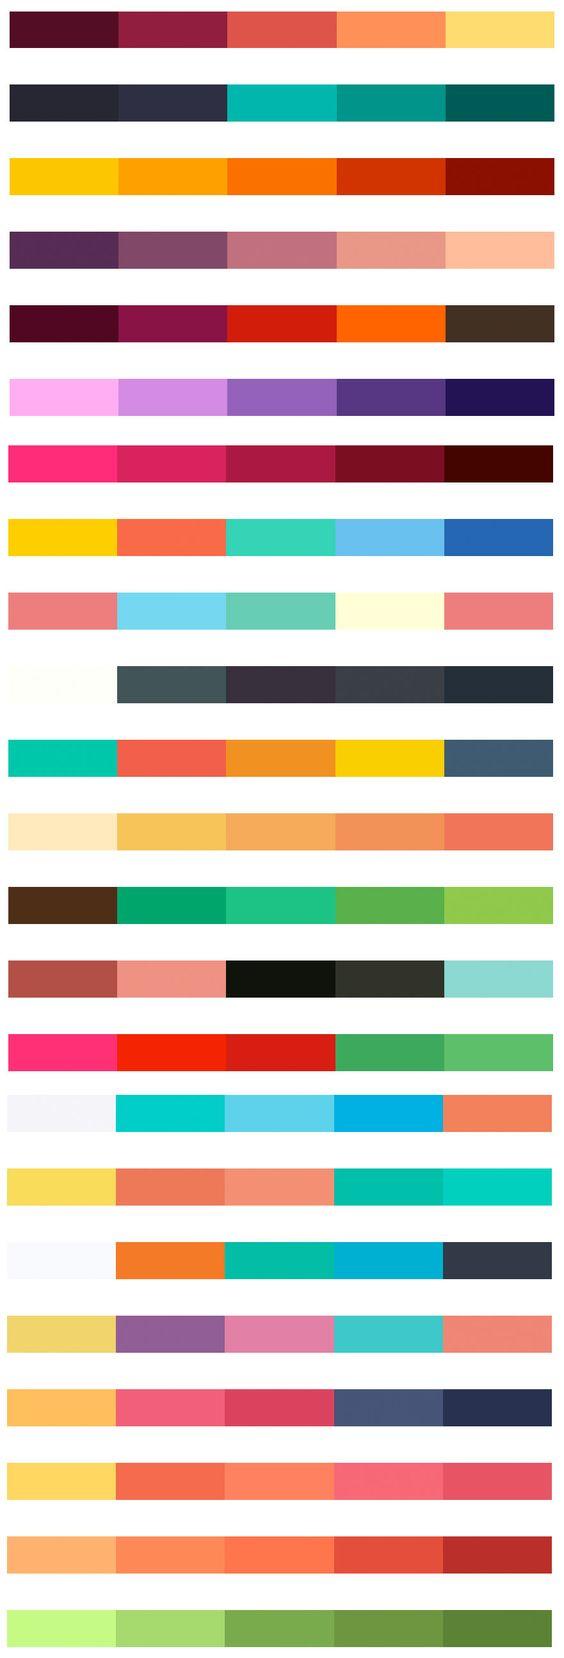 Flat-UI Colors | Autumn Edition